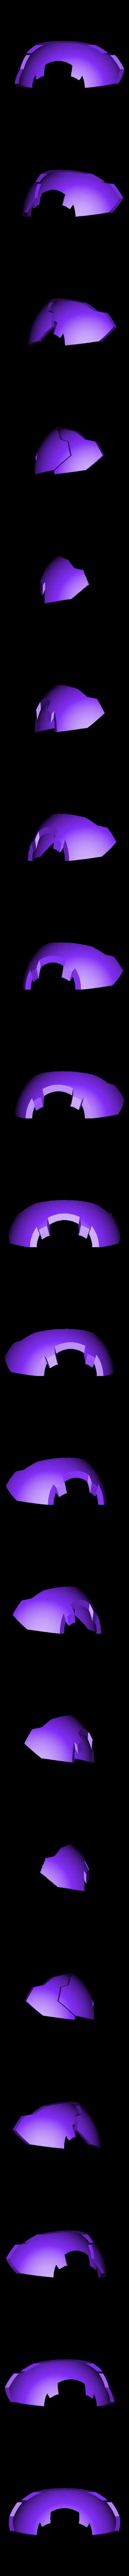 Armor-Rear.stl Download STL file Hammond's Wrecking Ball Mech from Overwatch • 3D printer template, FunbieStudios